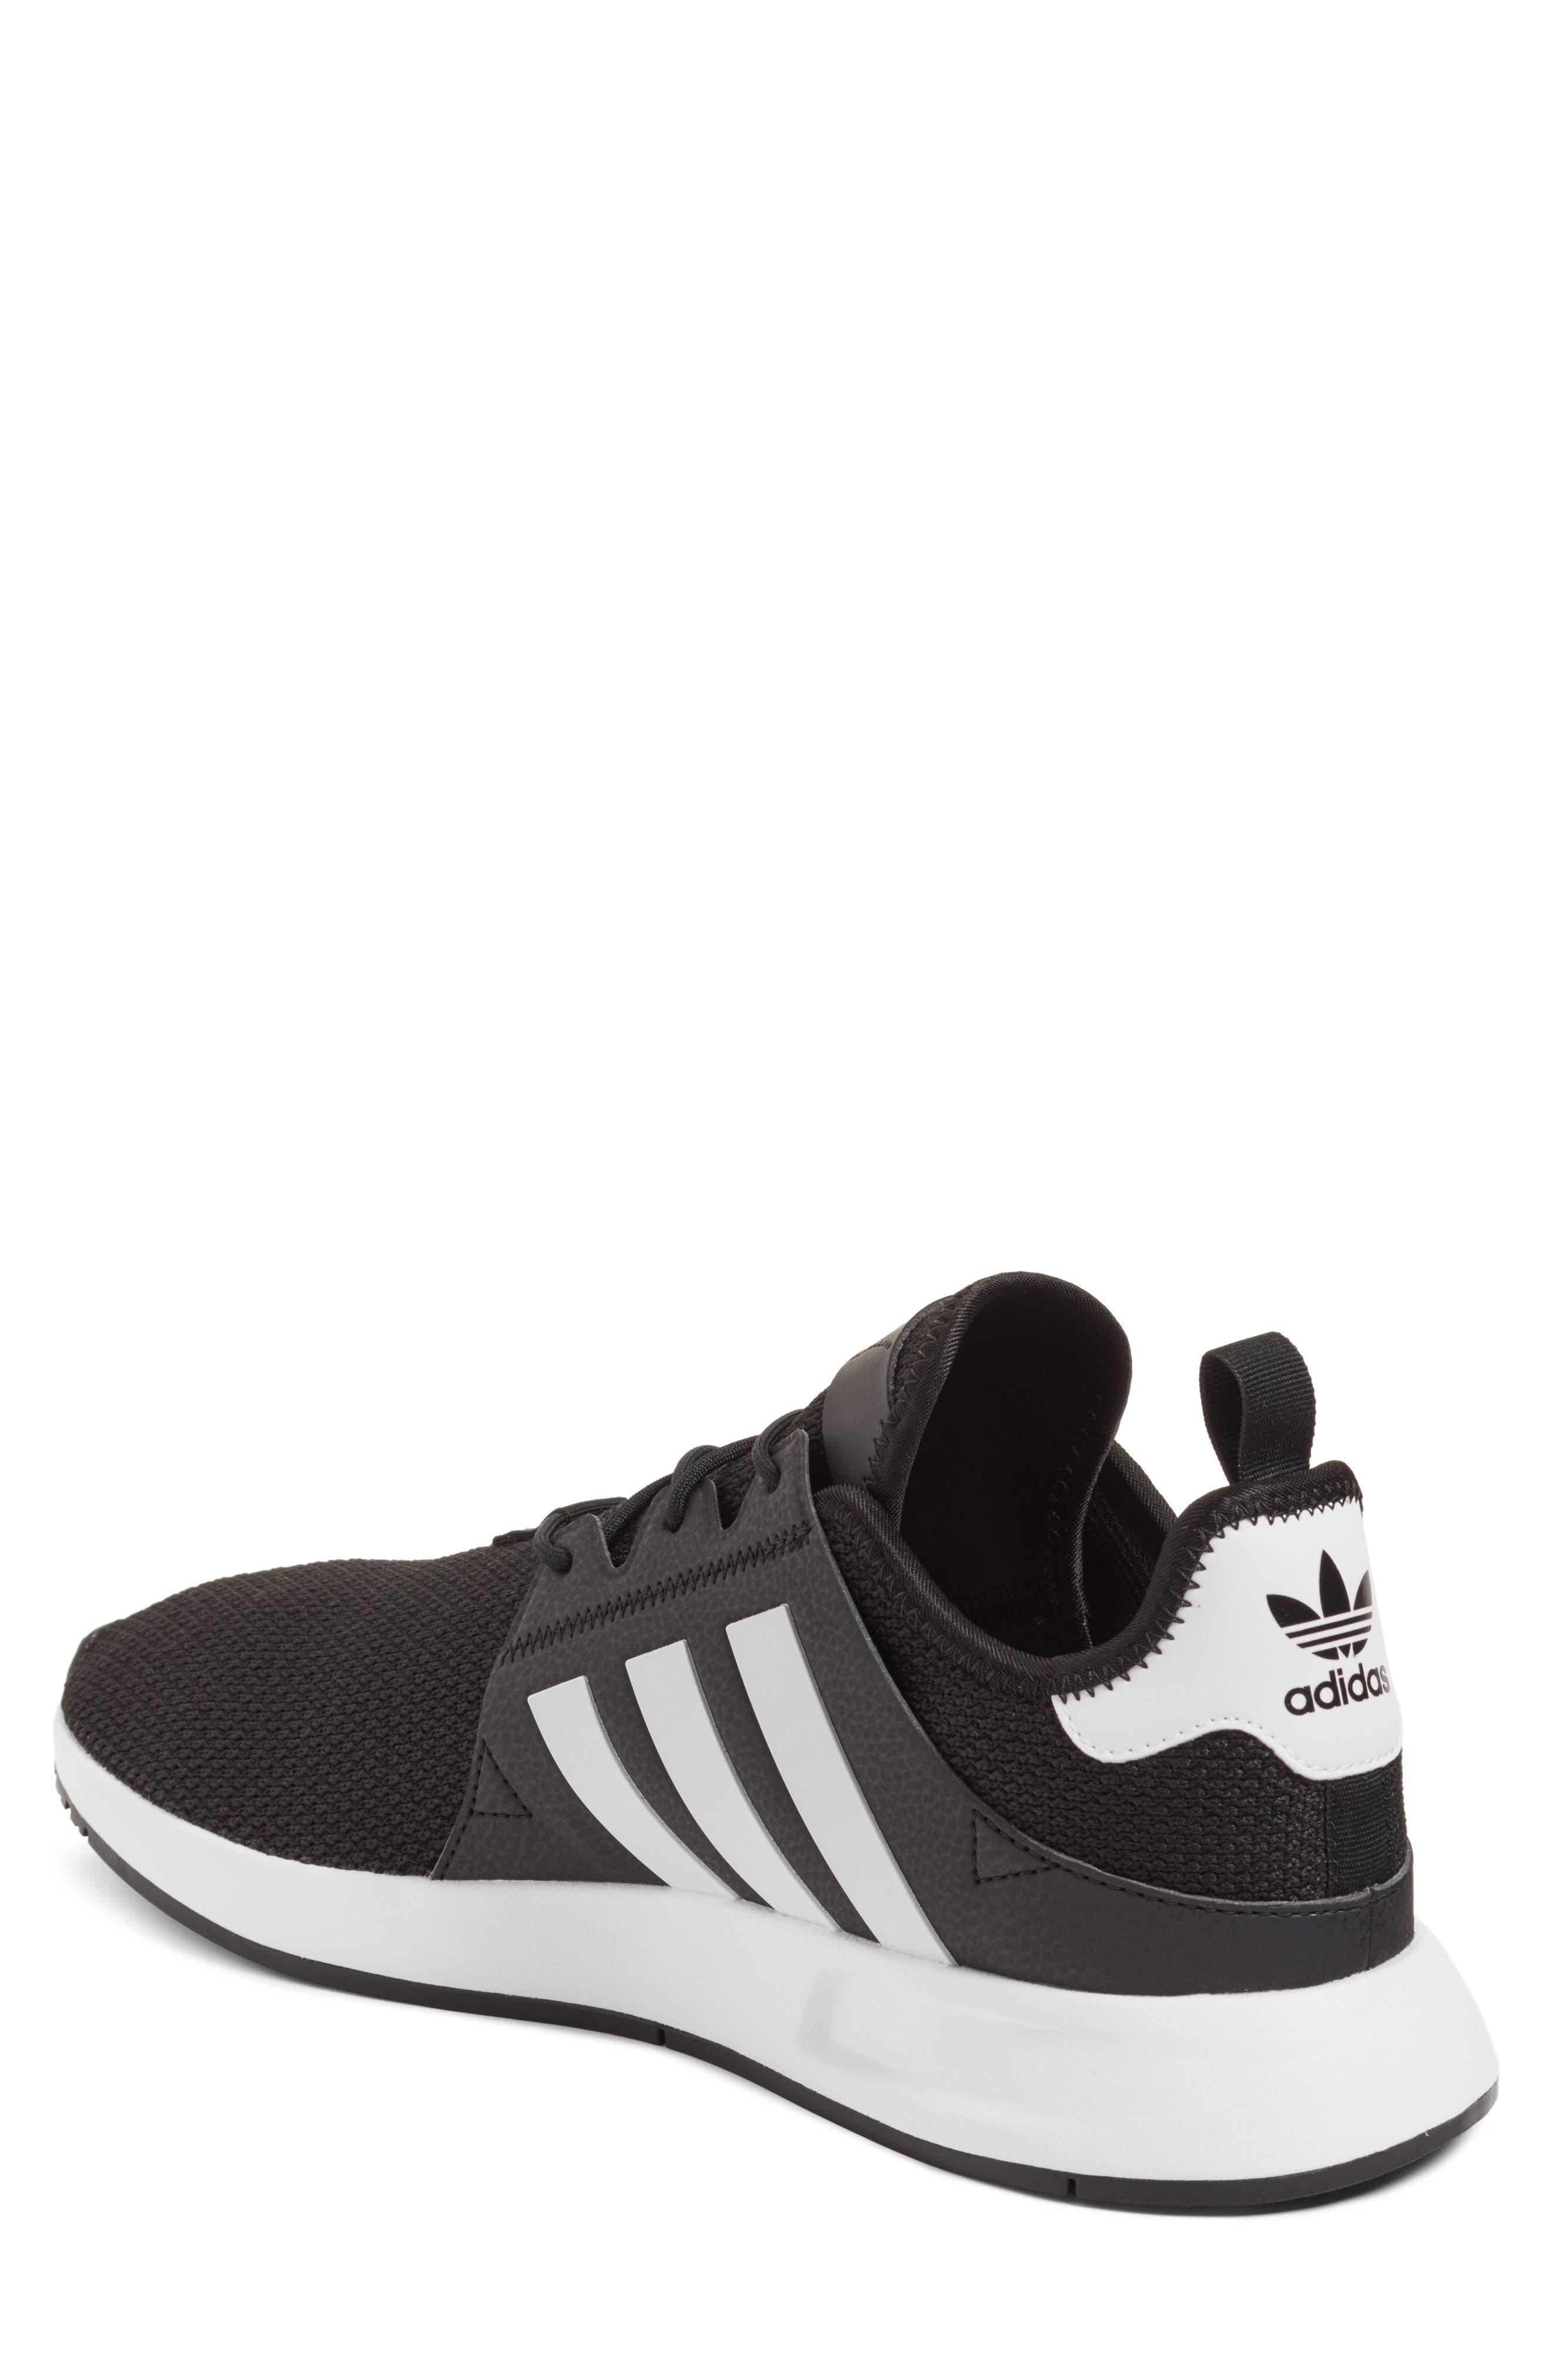 X_PLR Sneaker,                             Alternate thumbnail 2, color,                             Black/ White/ Black